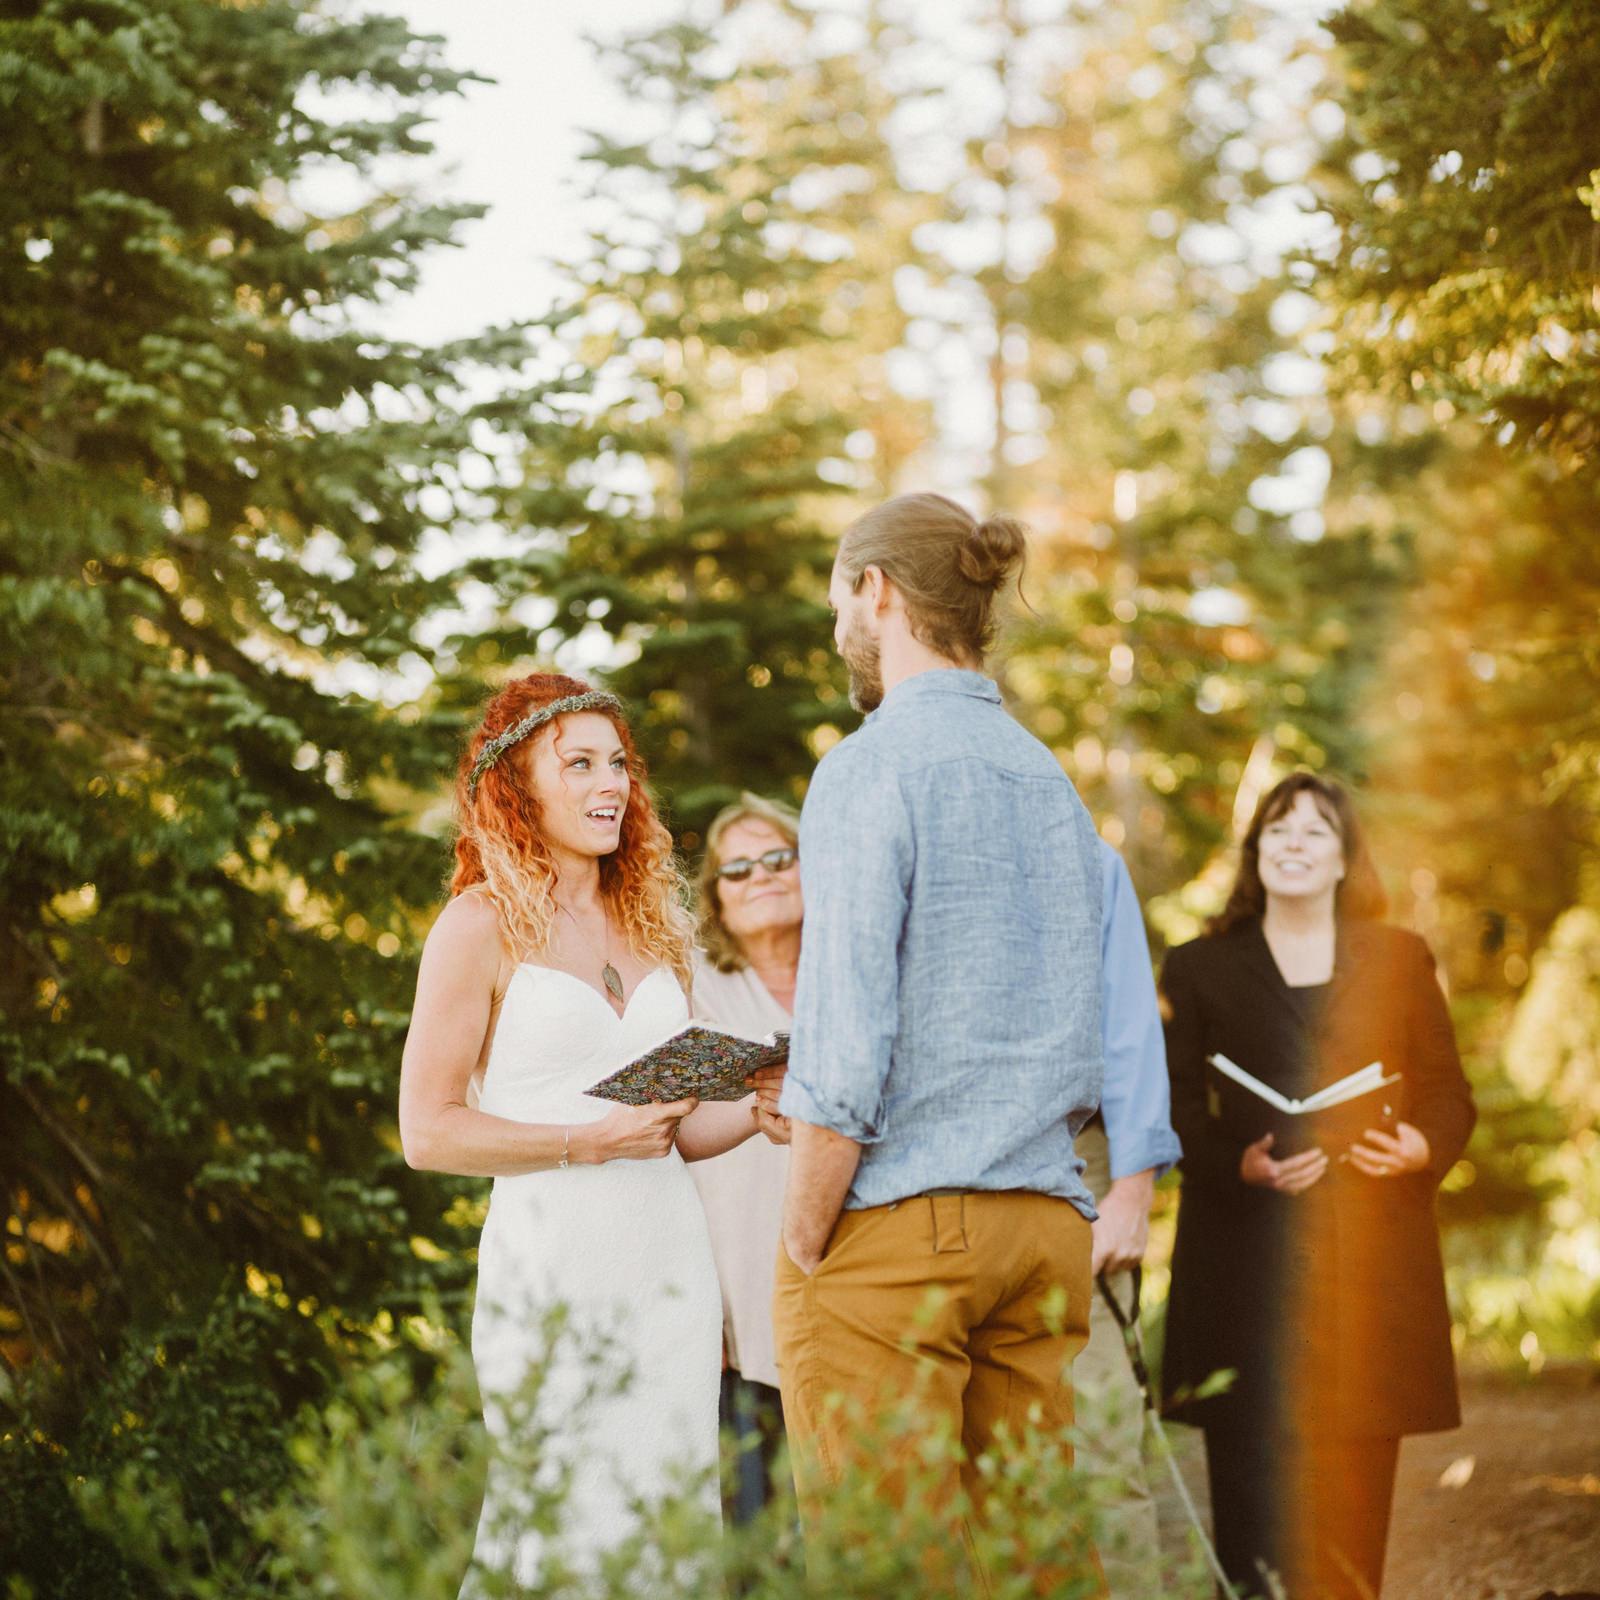 lake-tahoe-elopement-073 LAKE TAHOE ELOPEMENT